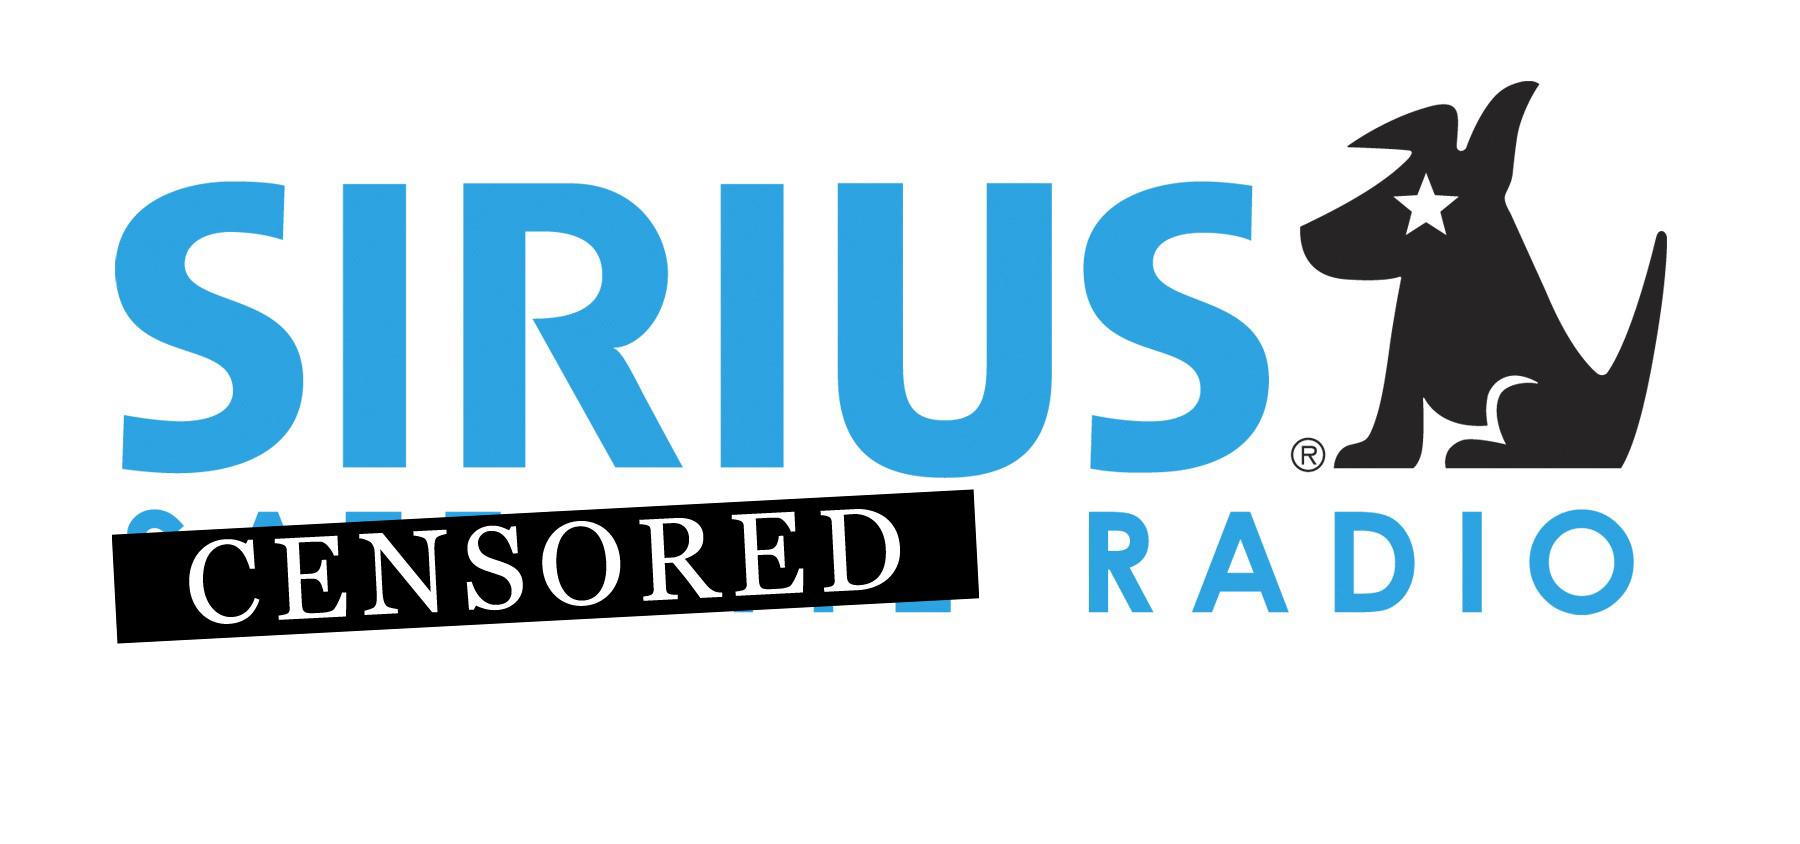 Censored Sirius